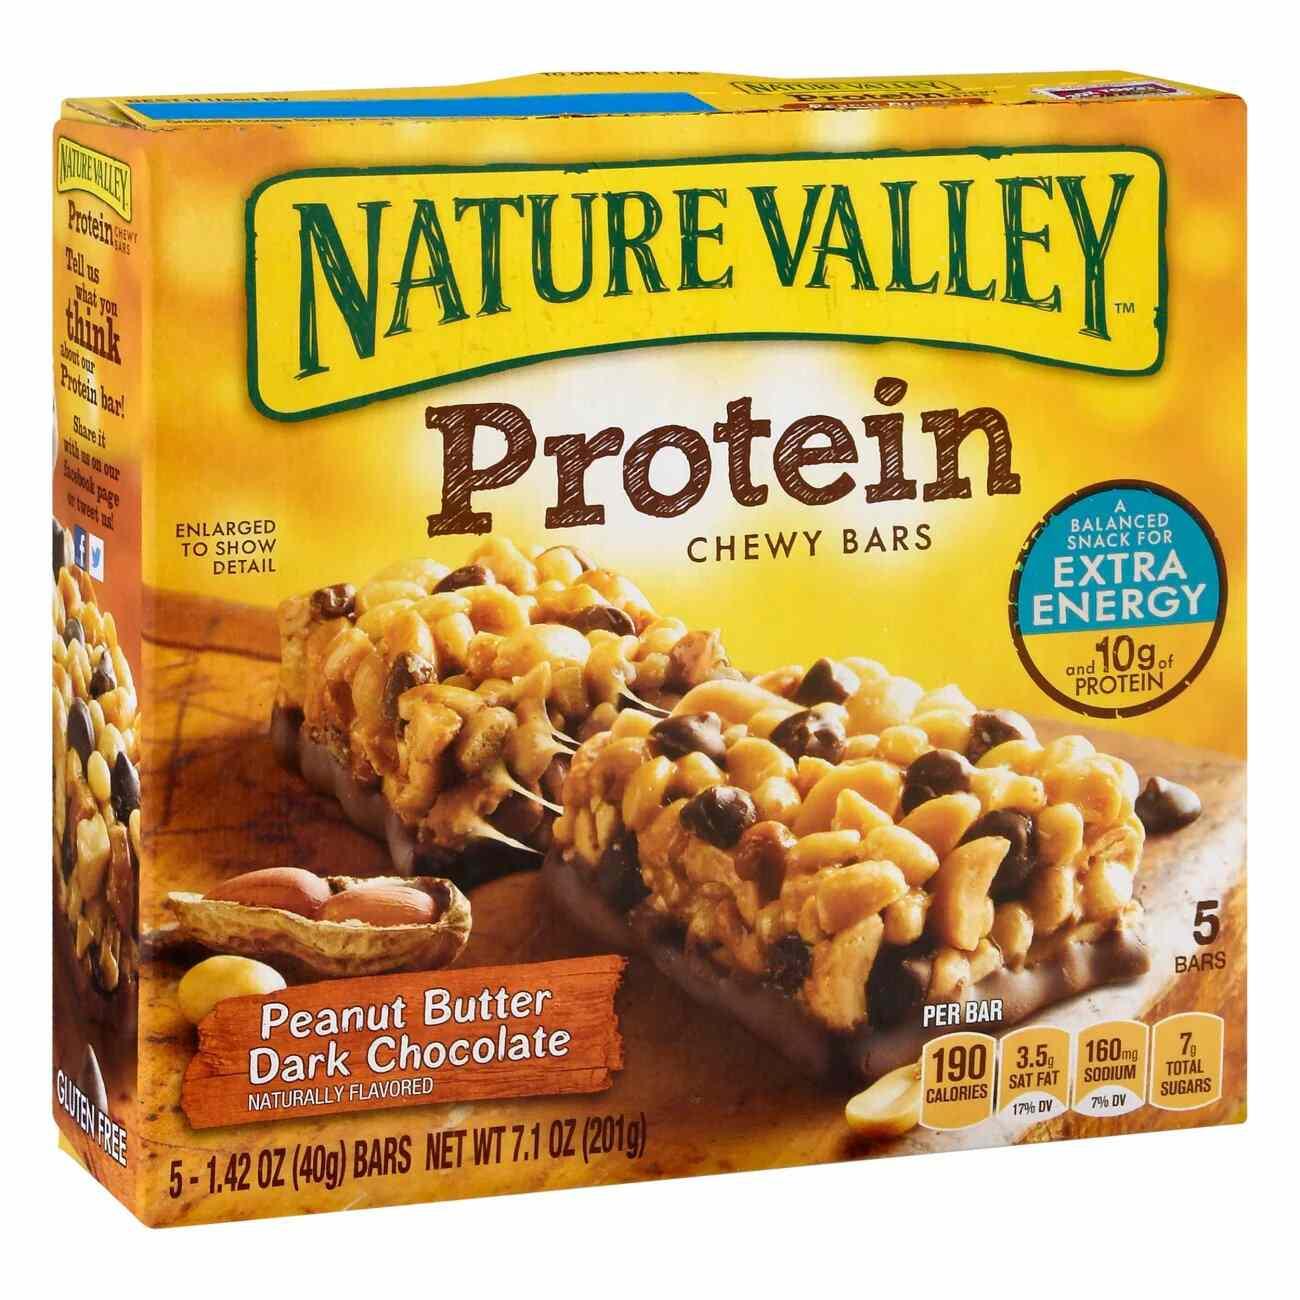 Nature Valley Peanut Butter Dark Chocolate Protein Bars